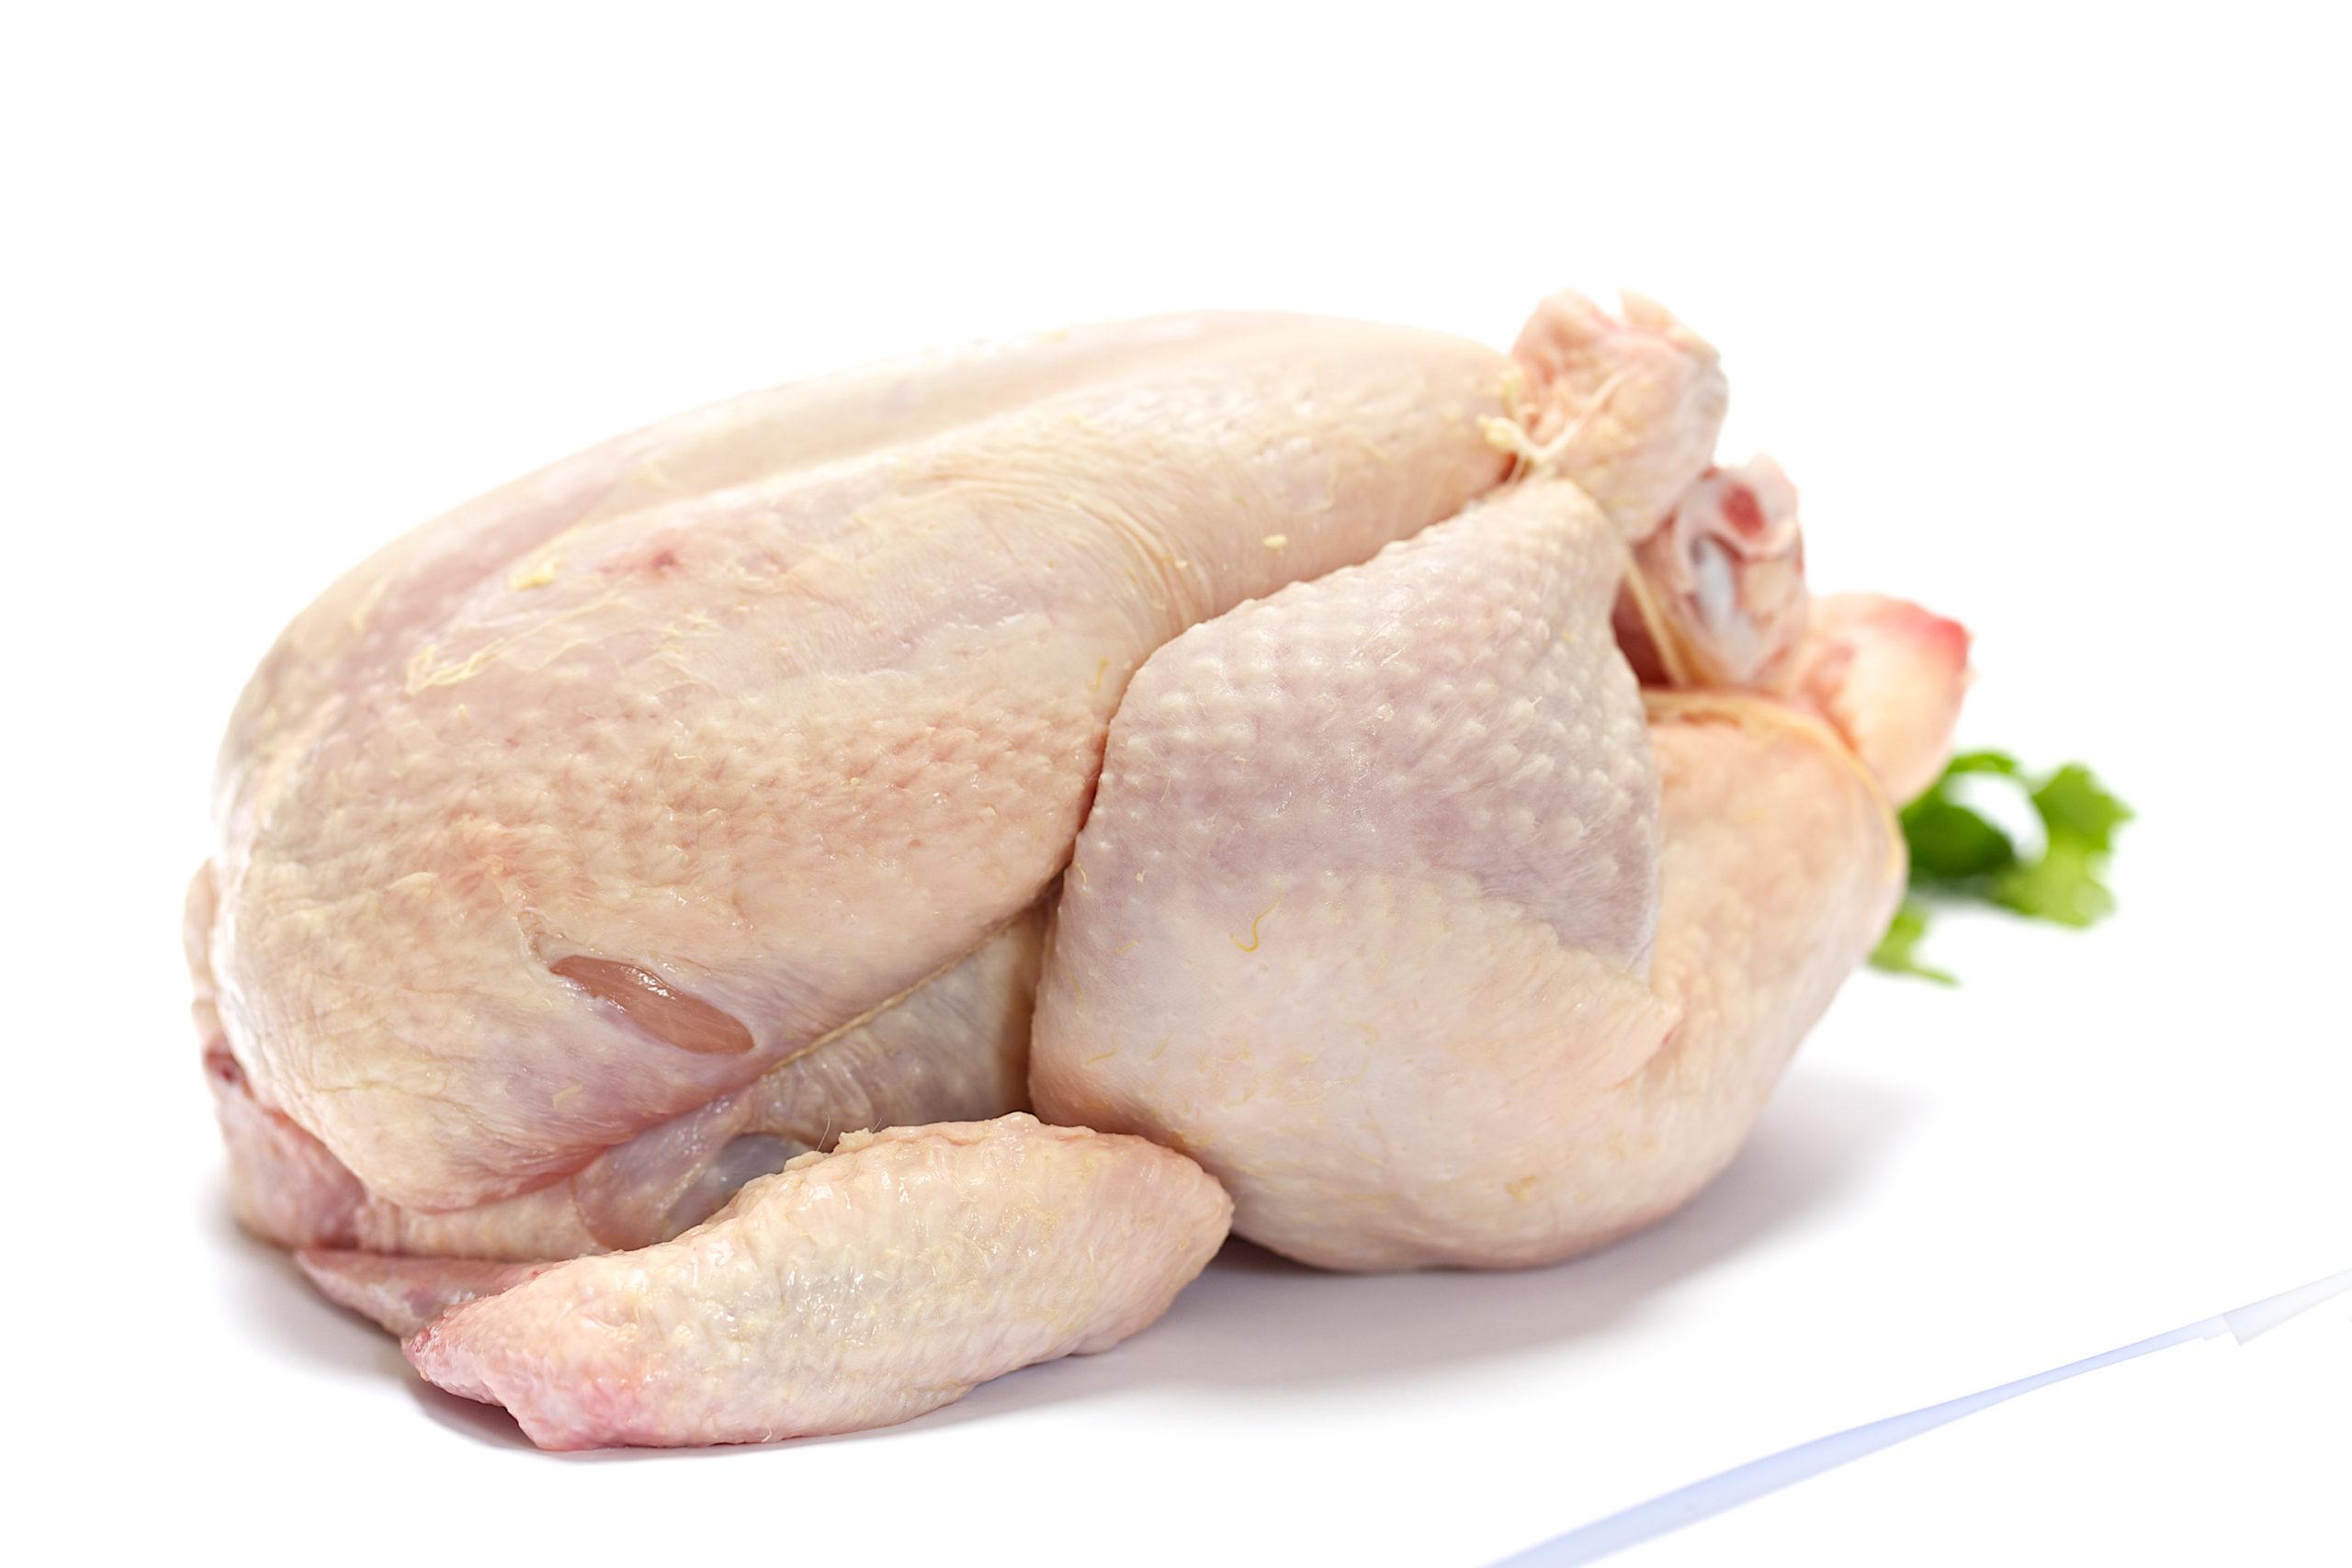 Whole Chicken, Glatt kosher